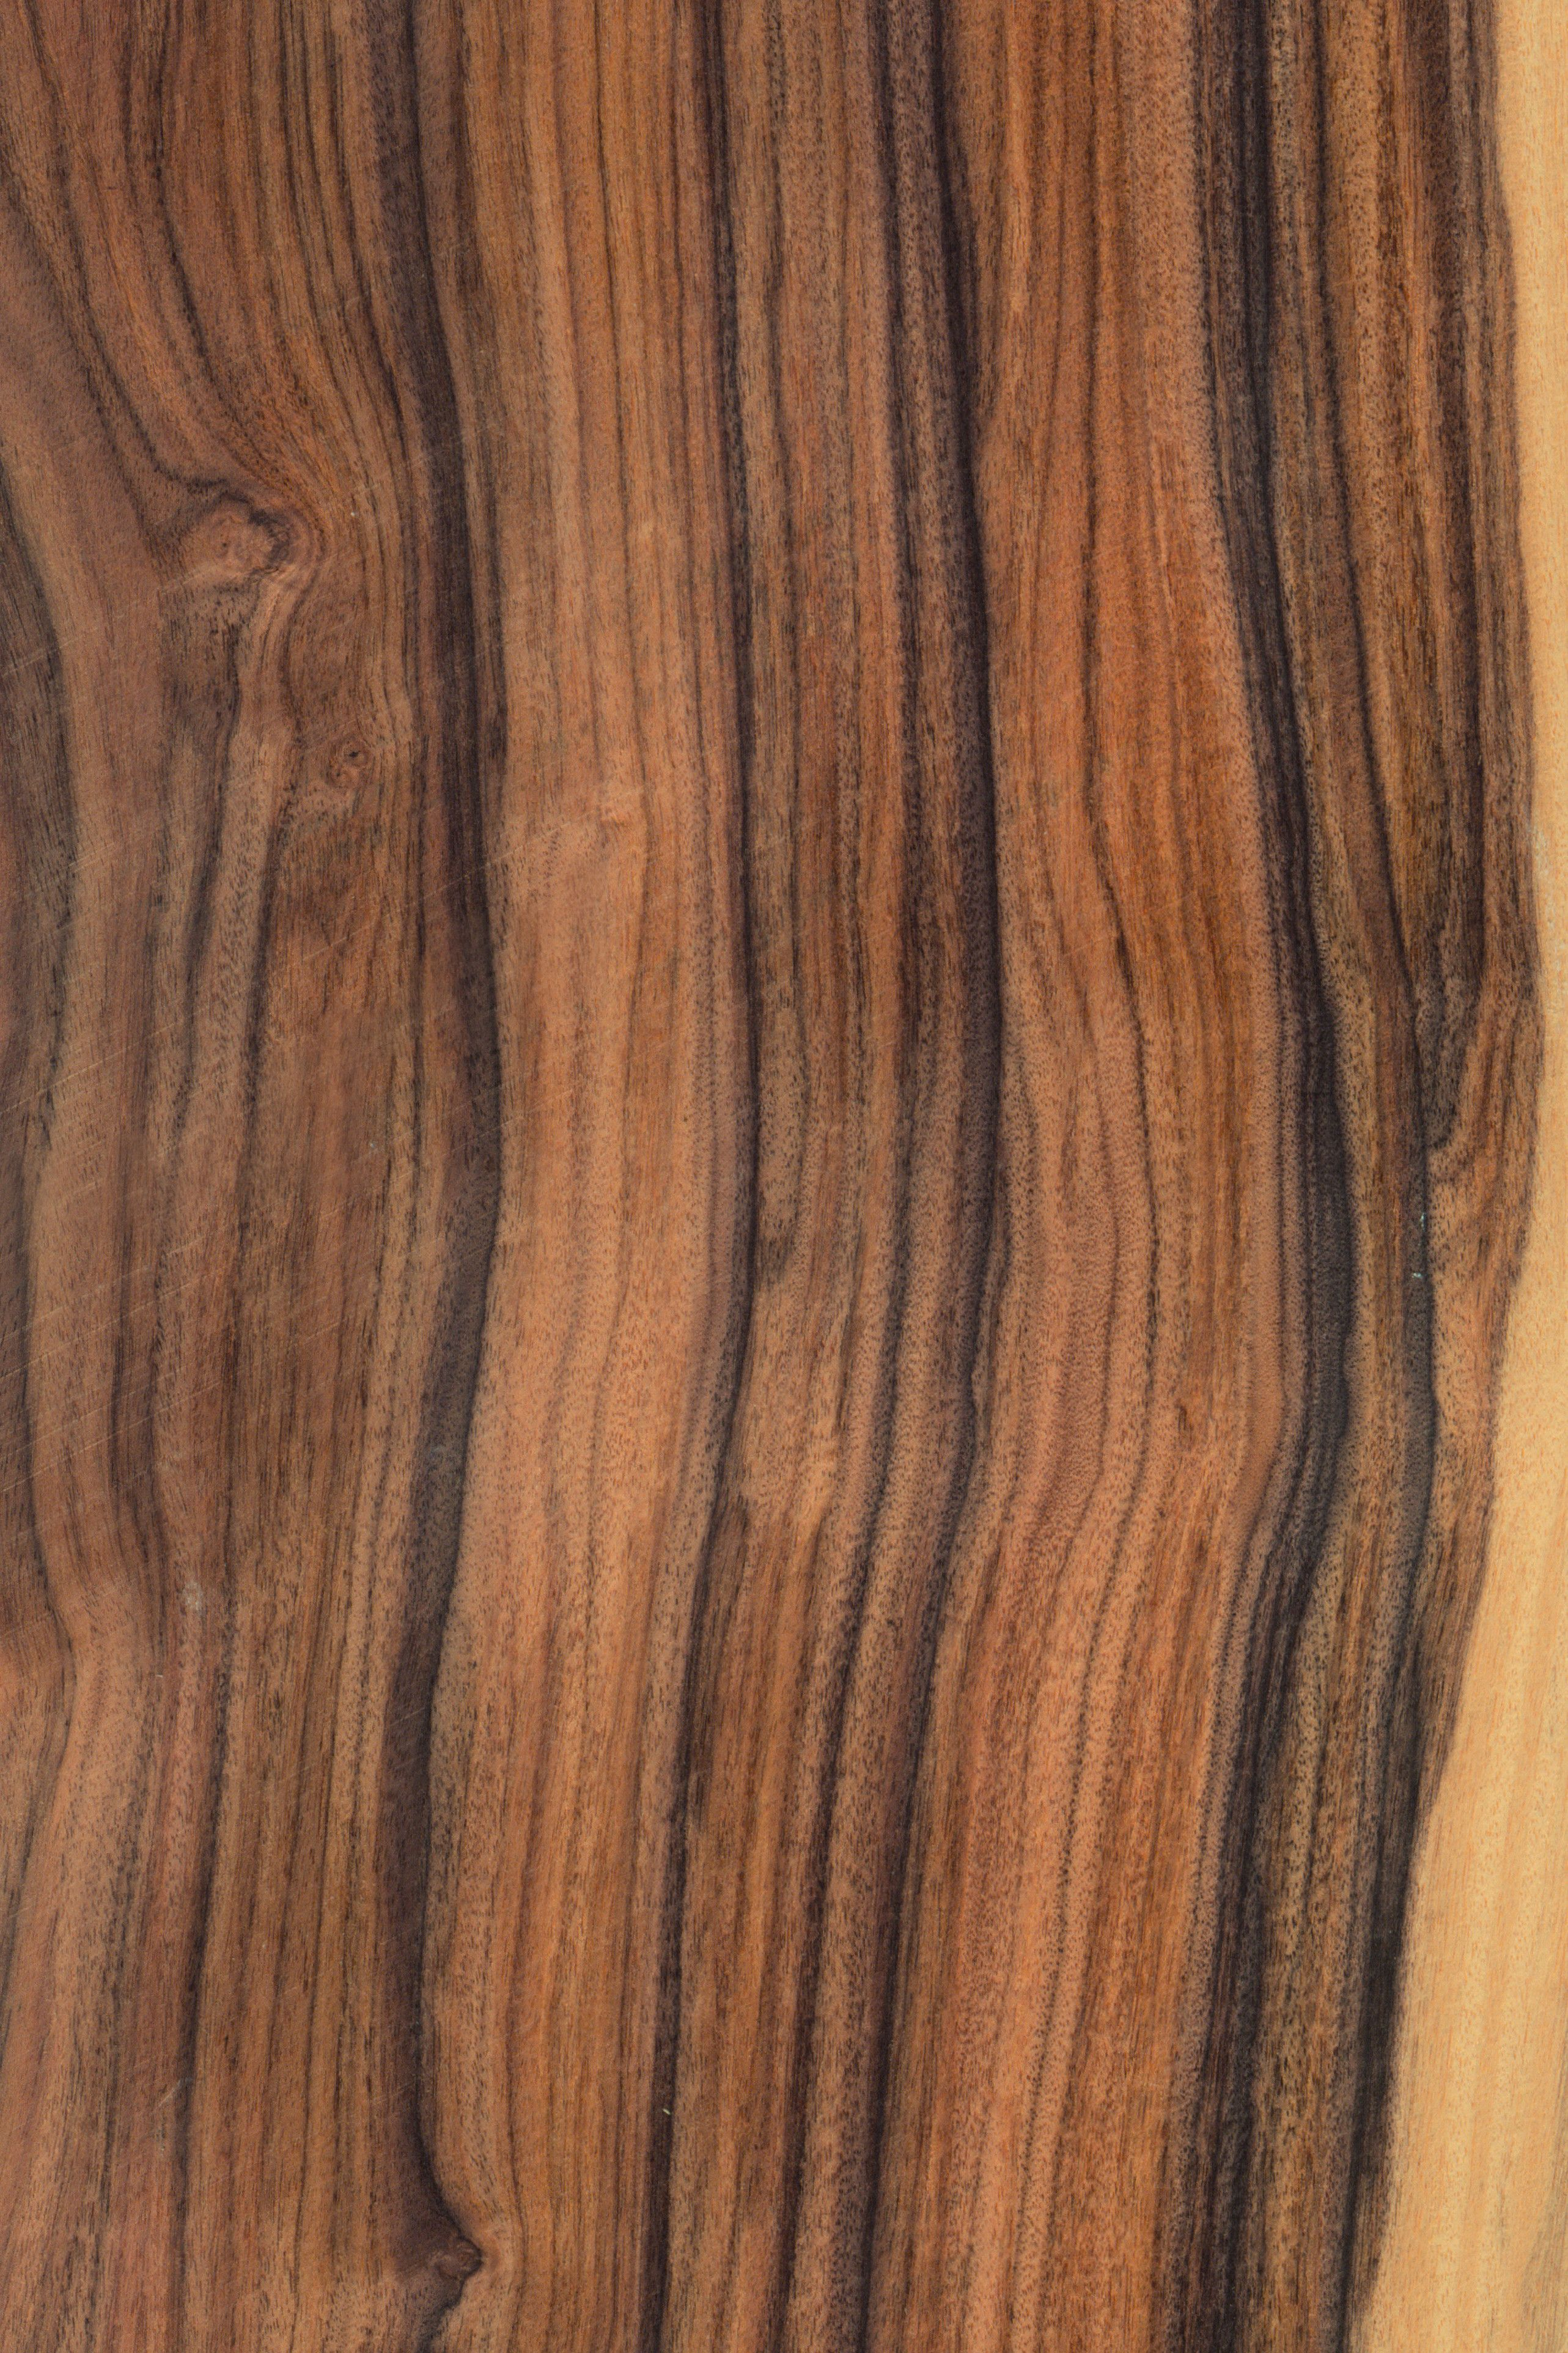 palisander santos furnier holzart palisander blatt rot braun exoten holzarten furniere. Black Bedroom Furniture Sets. Home Design Ideas